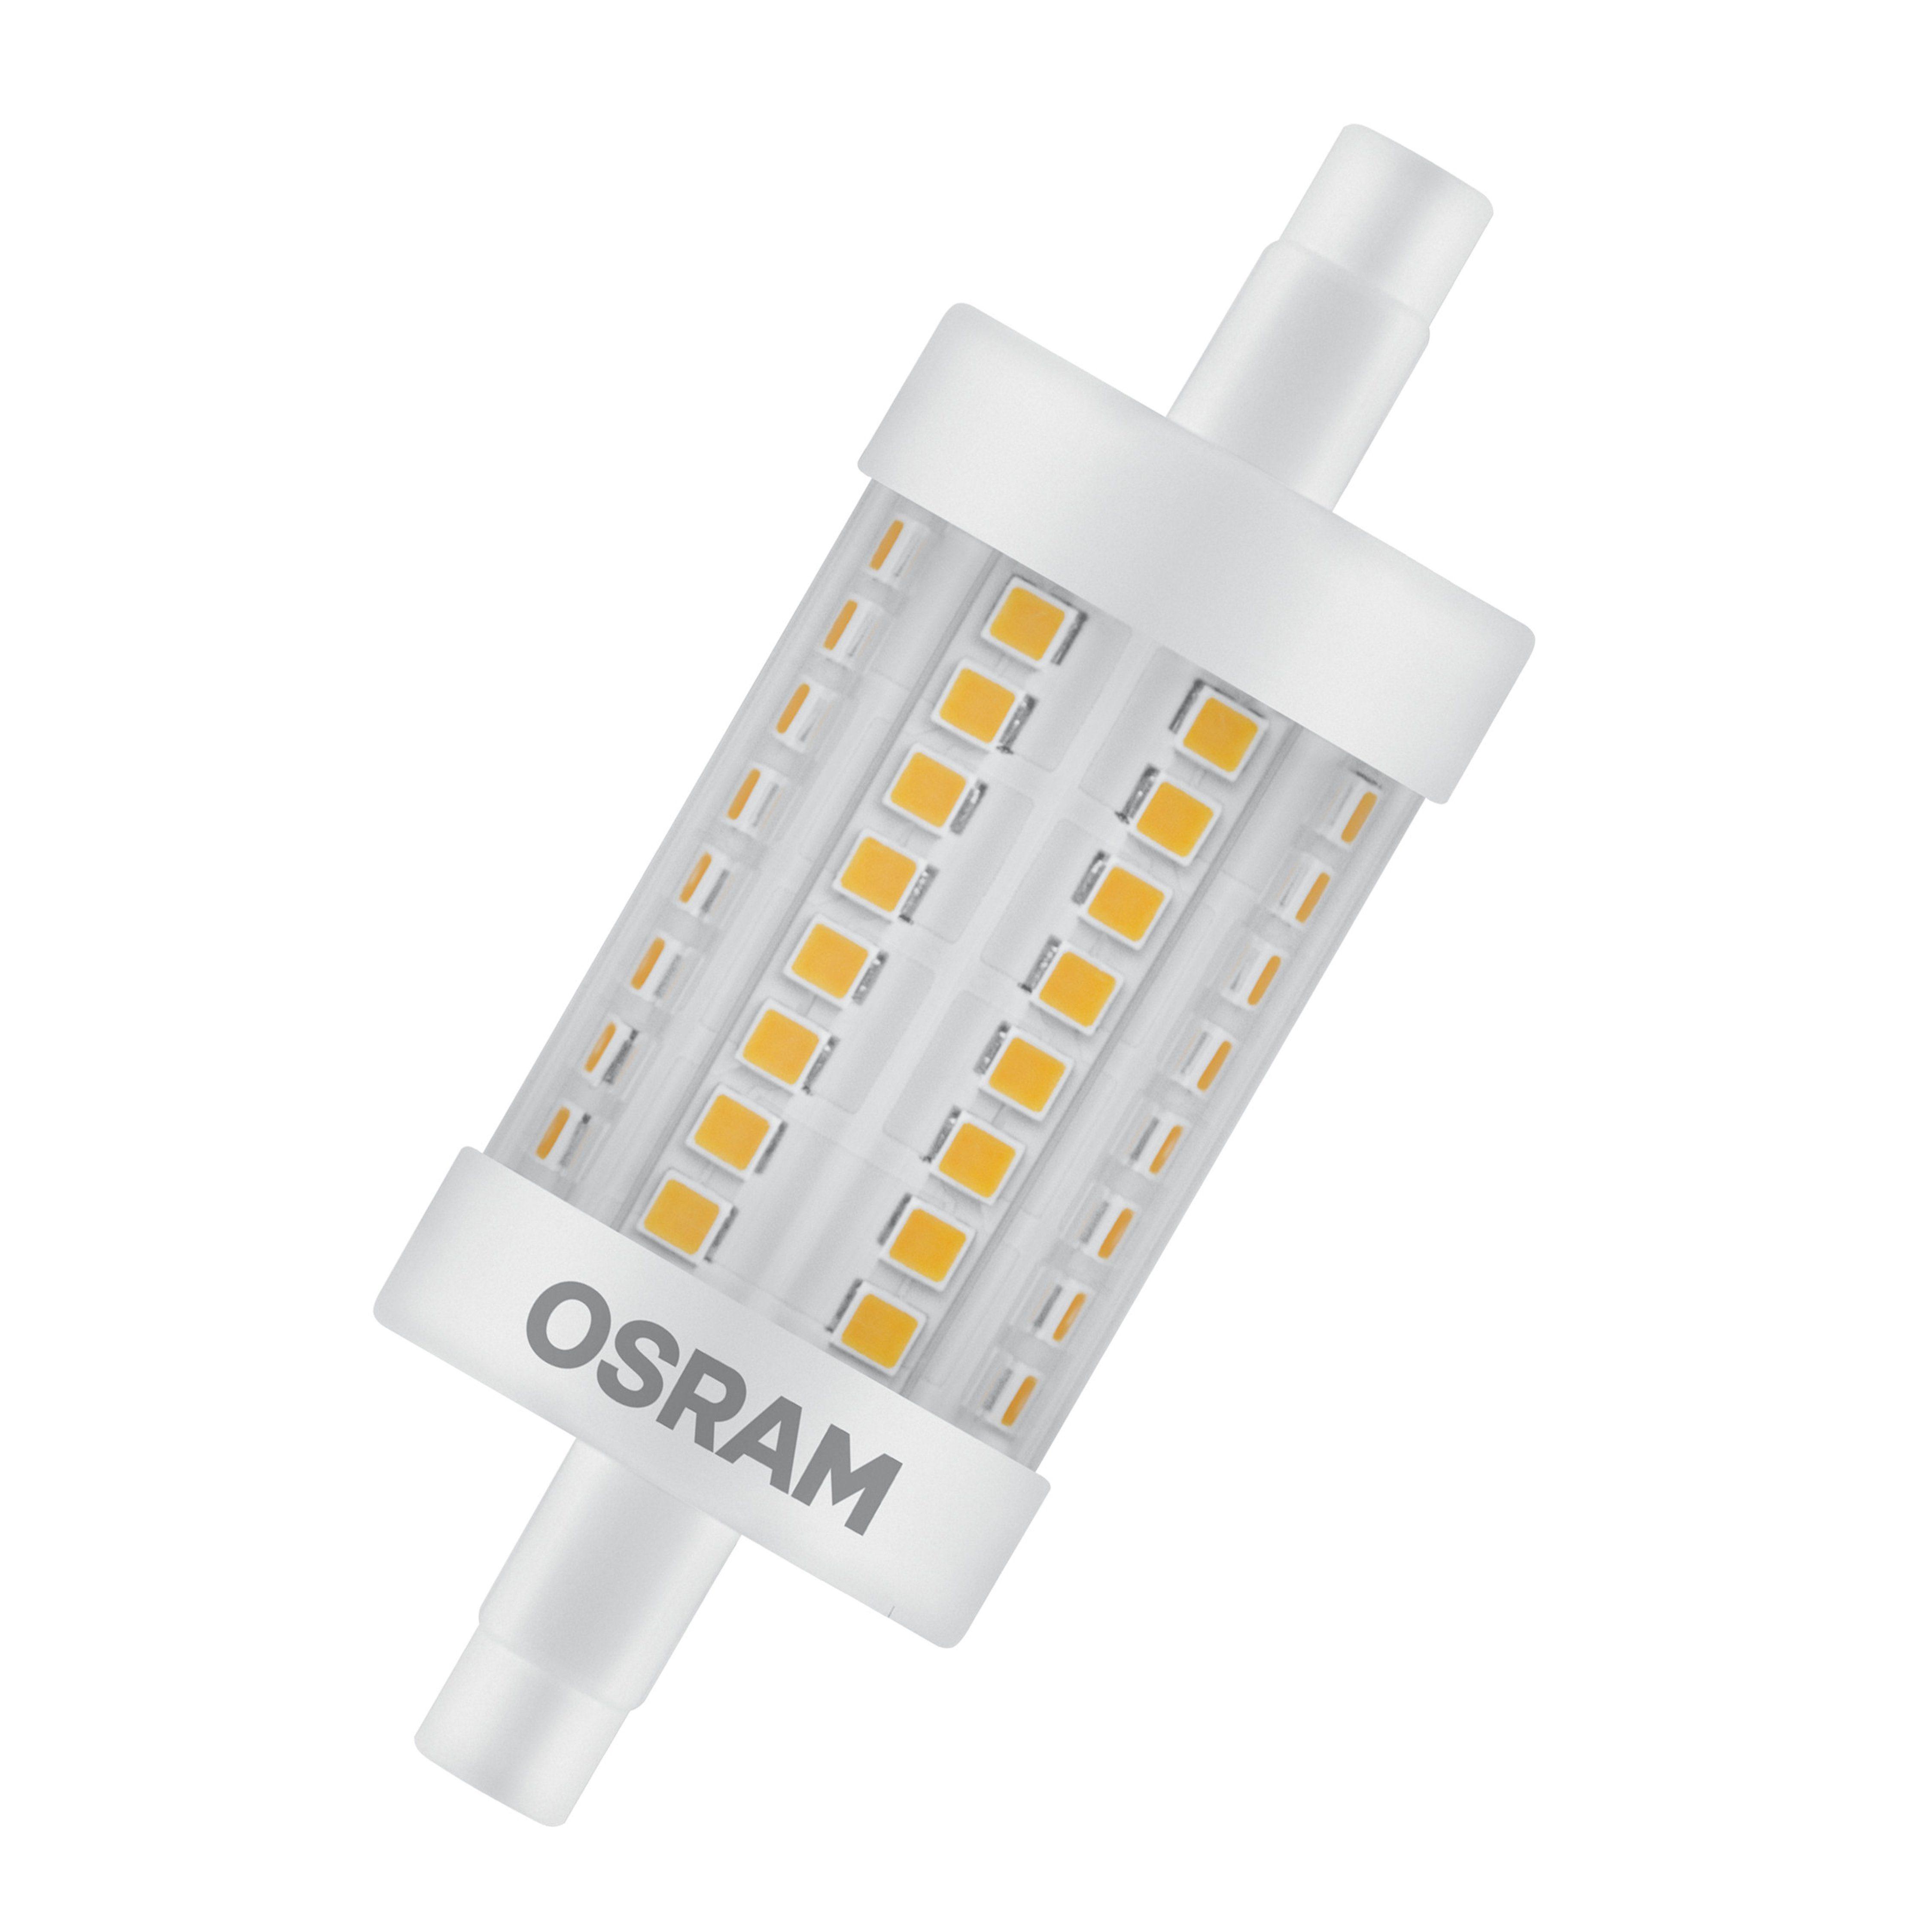 Osram LED SUPERSTAR LINE R7s, LED-Lampe, dimmbar »SST LINE 78.0 mm 75 8 W/827 R7s«